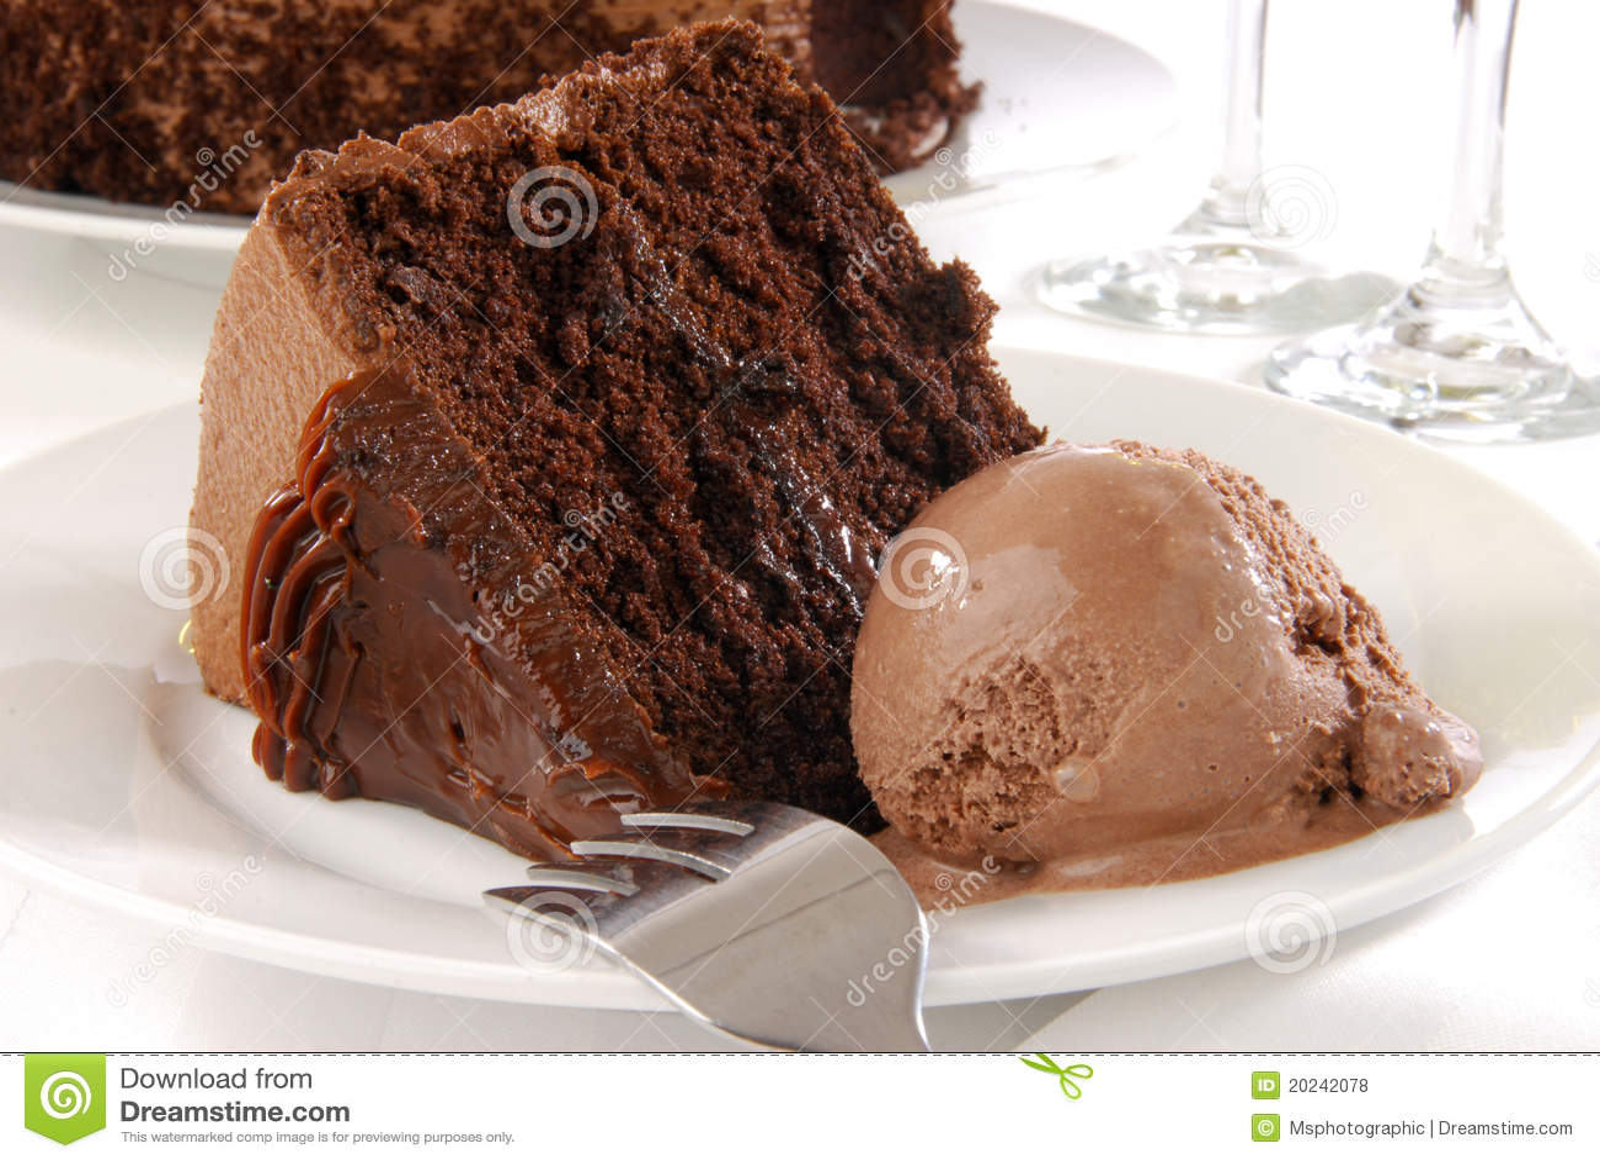 Chocolate Cake And Ice Cream Royalty Free Stock Photos ...